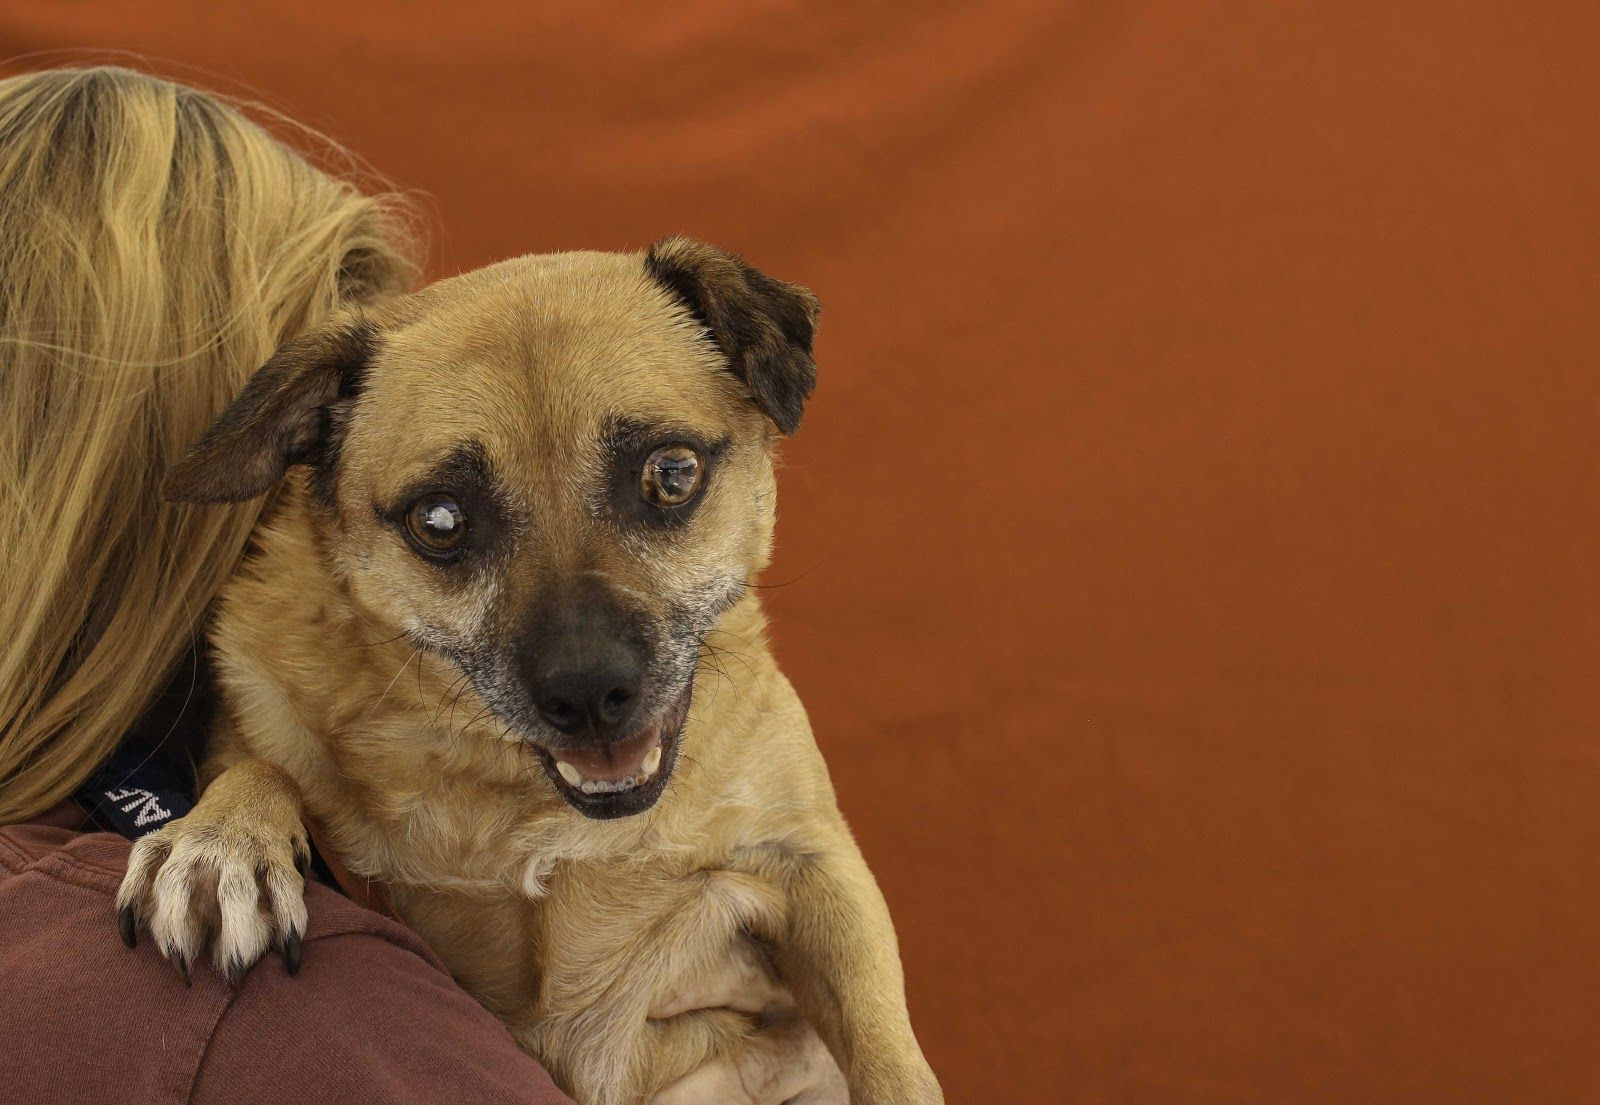 Chug dog for Adoption in Pasadena, CA. ADN617011 on